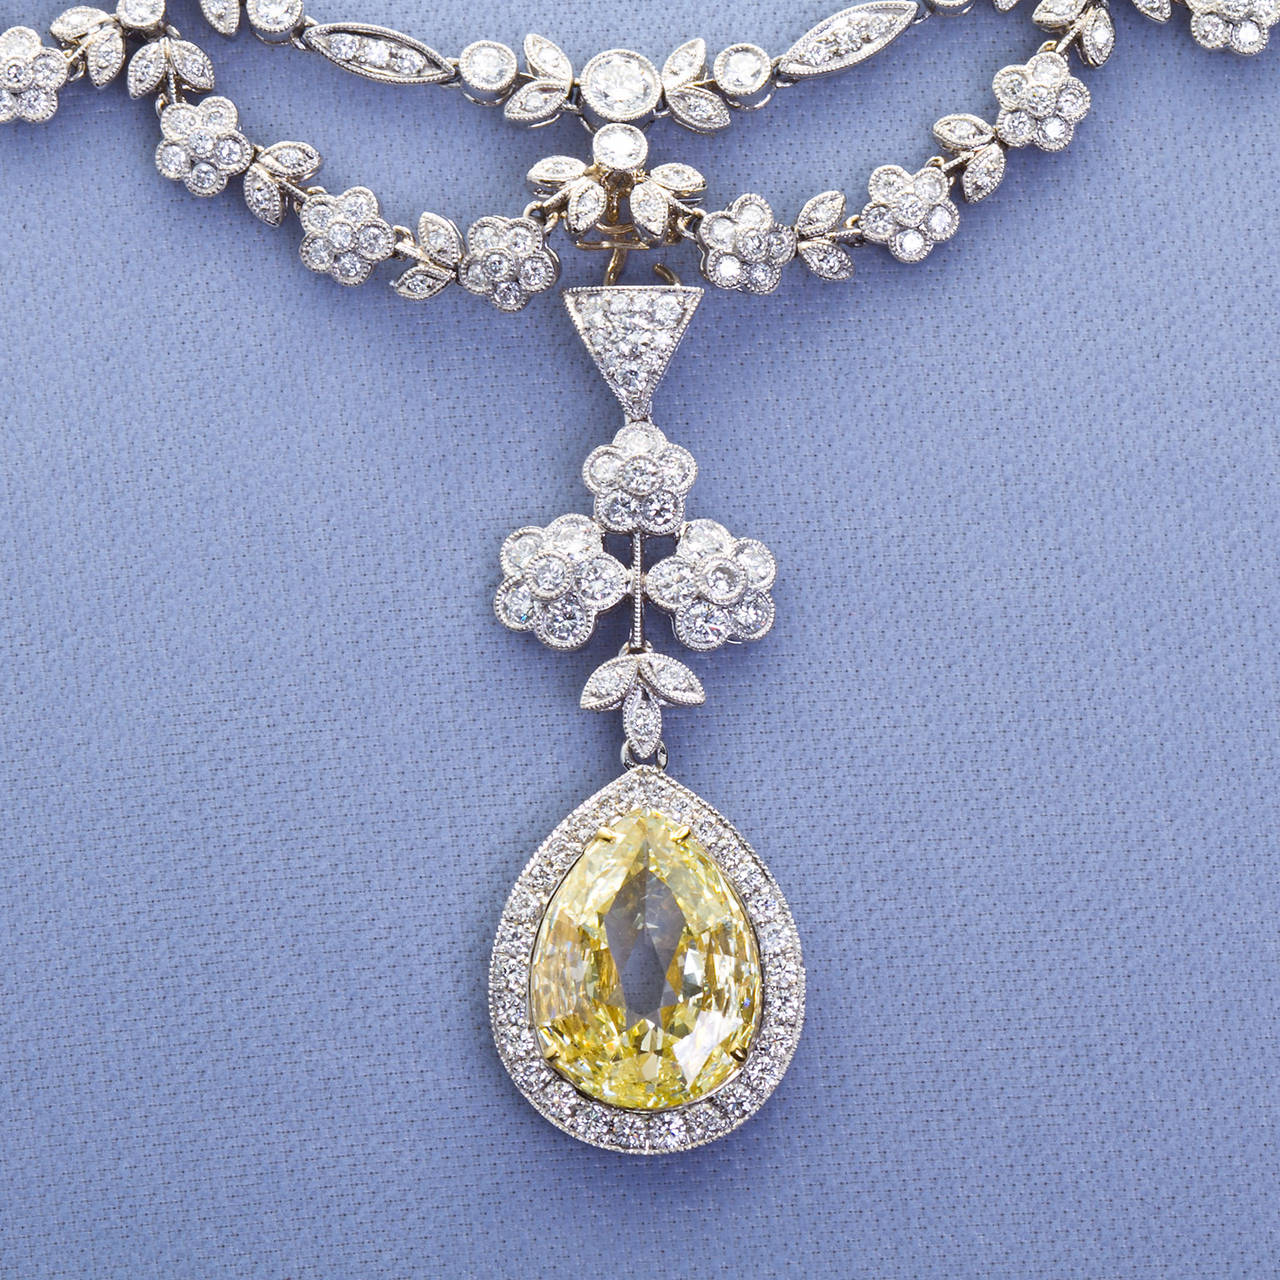 Antique 5.06 Carat Fancy Yellow Pear Shaped Diamond Drape Necklace 3